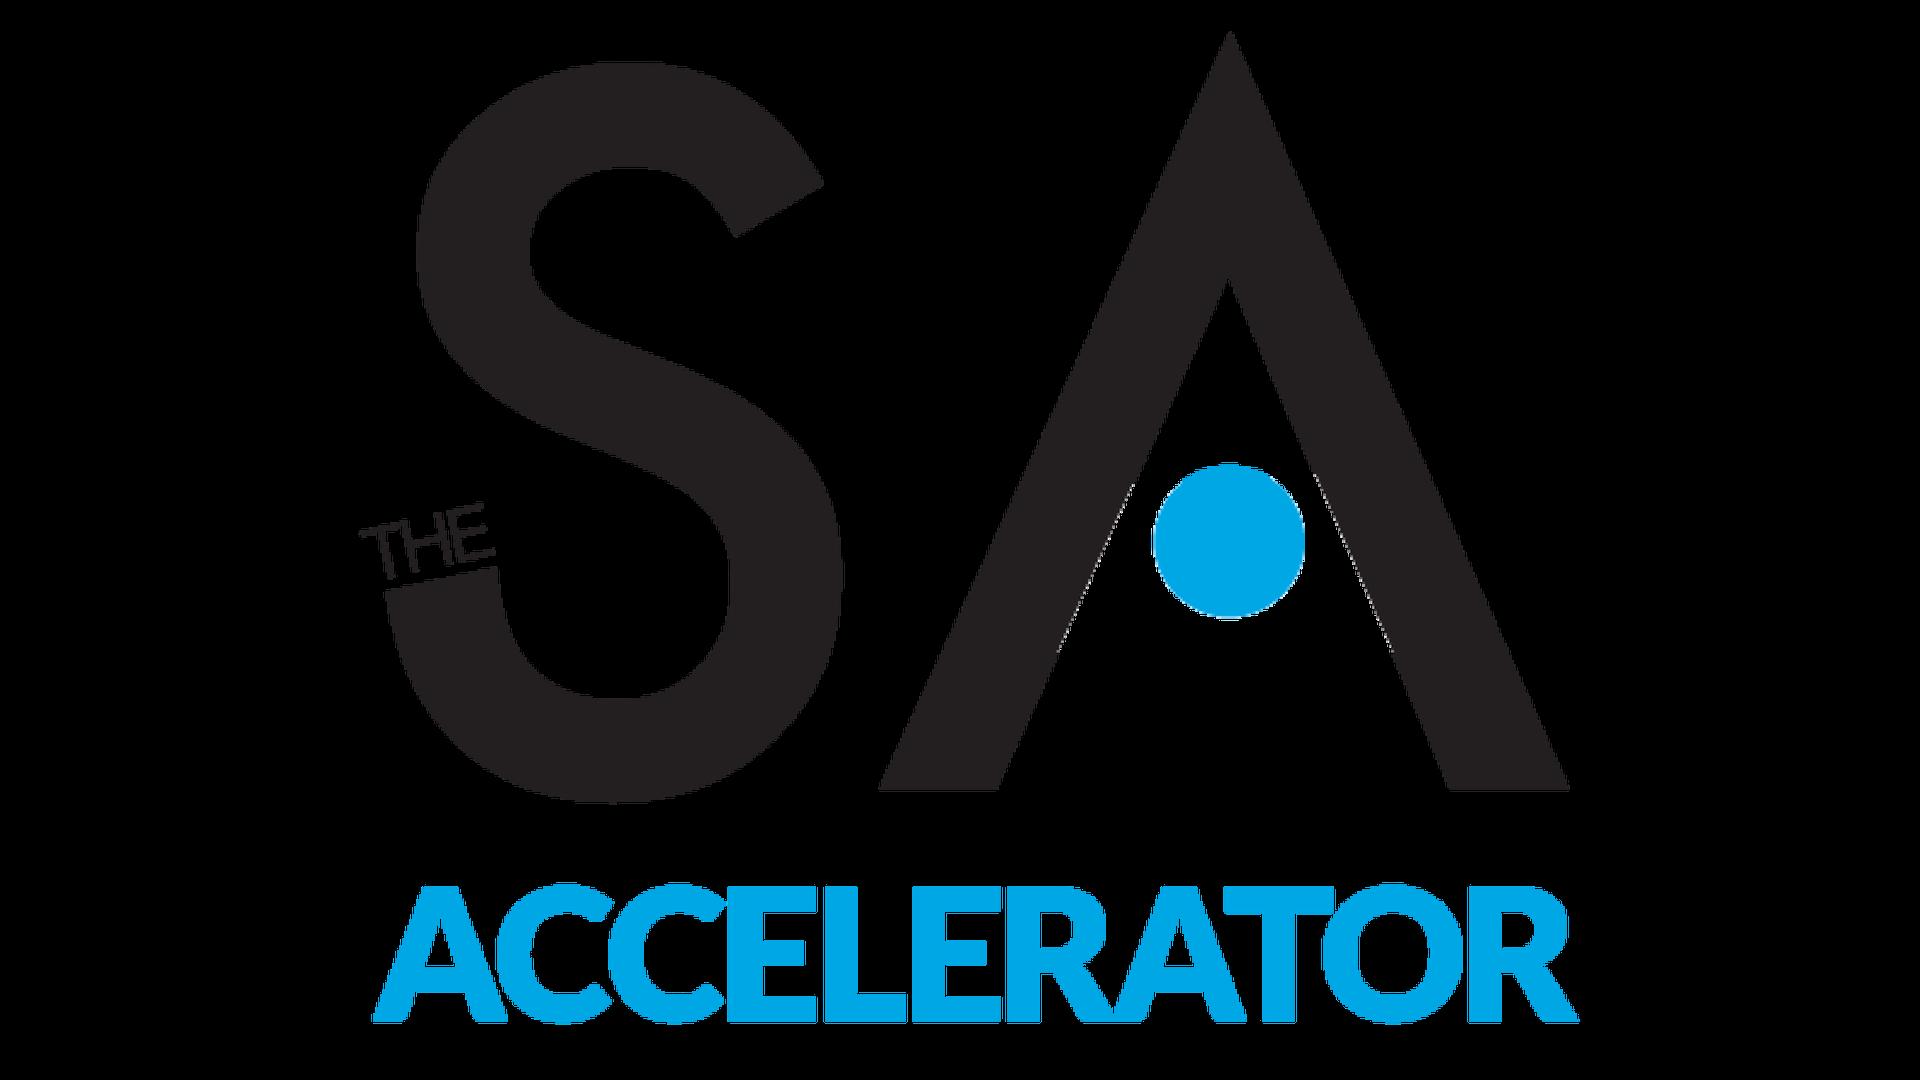 The SA Accelerator